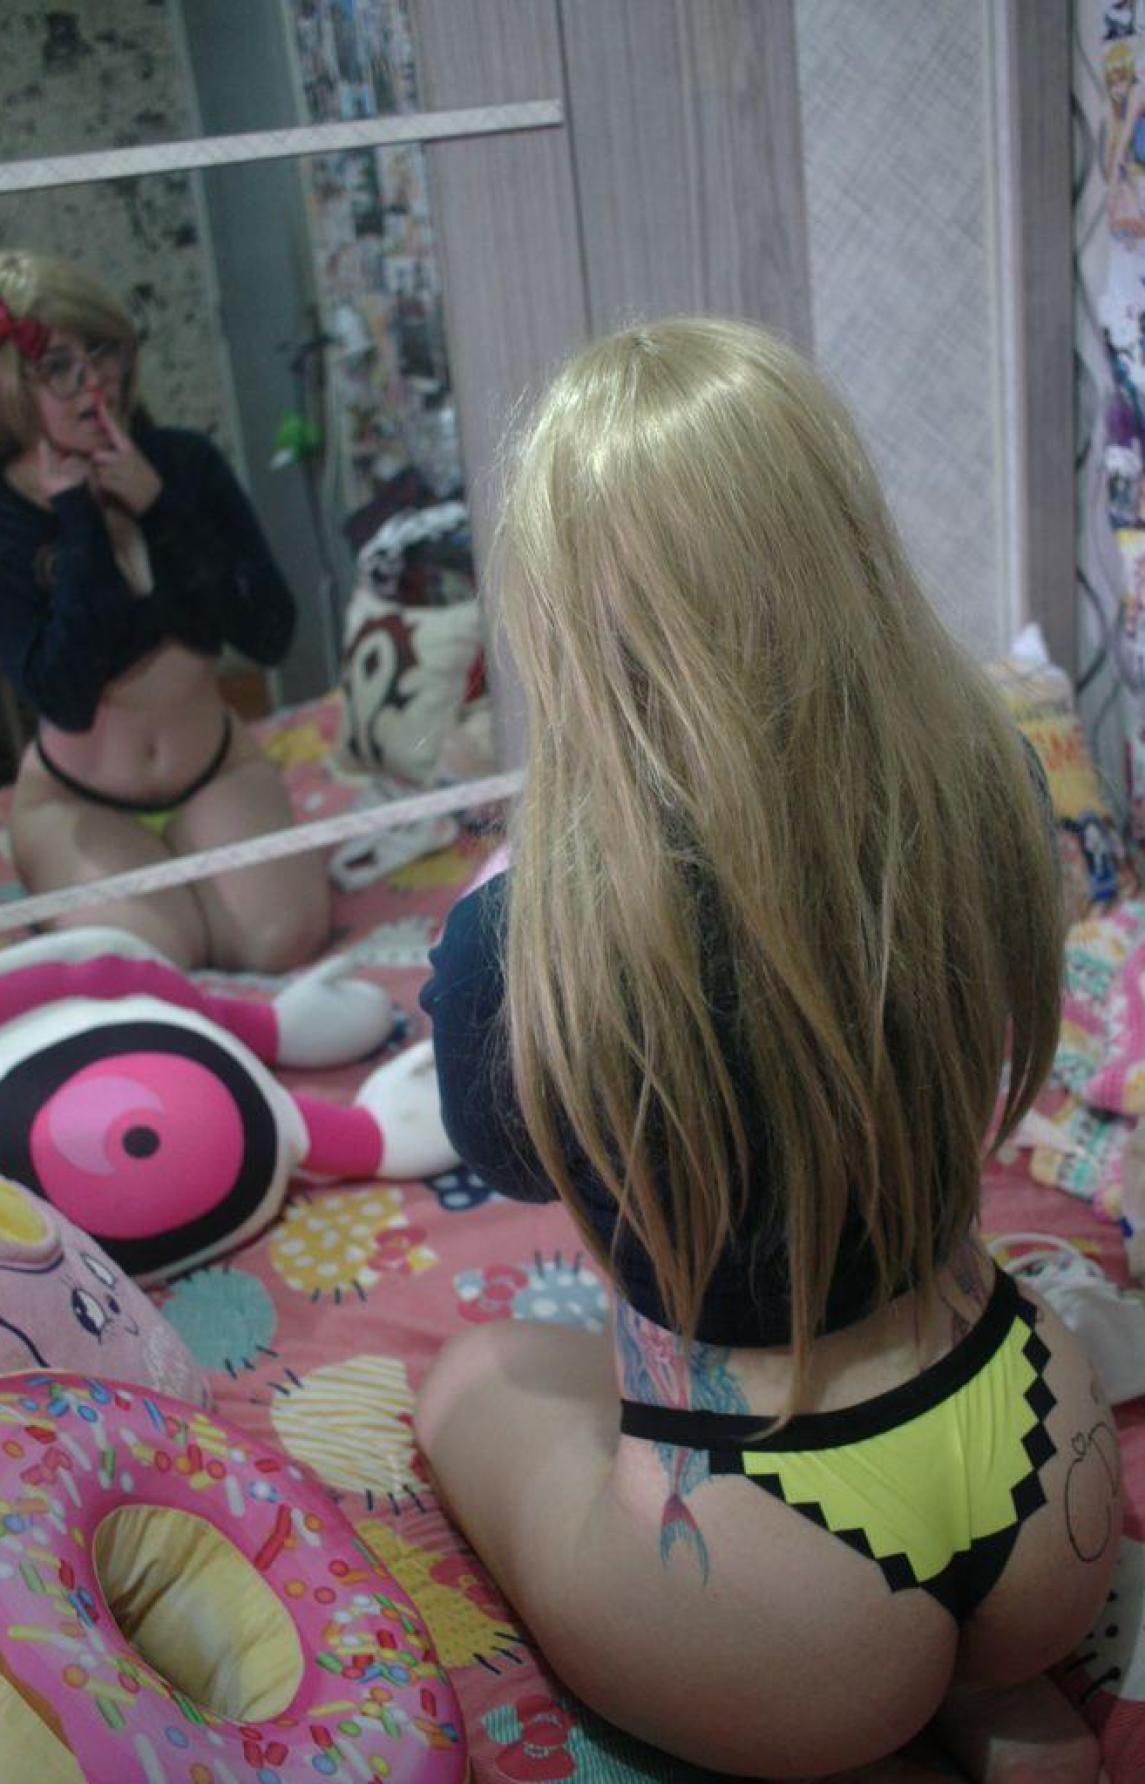 Camgirl cosplayer Naruko de calcinha